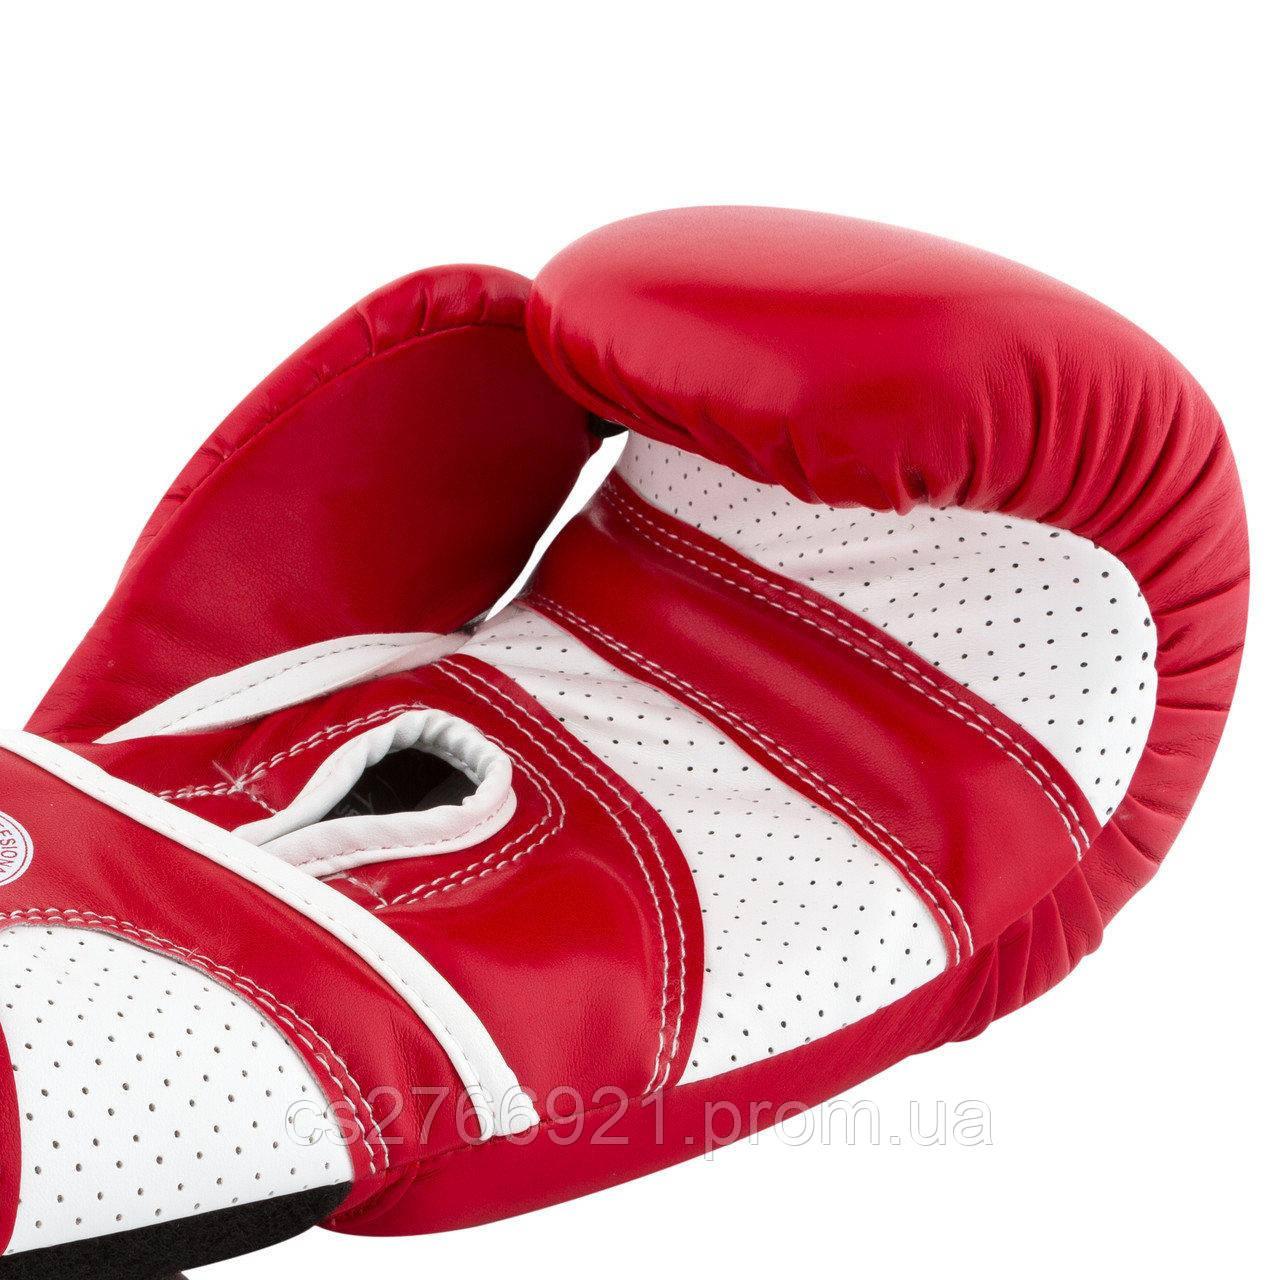 Боксерські рукавиці PowerPlay 3019